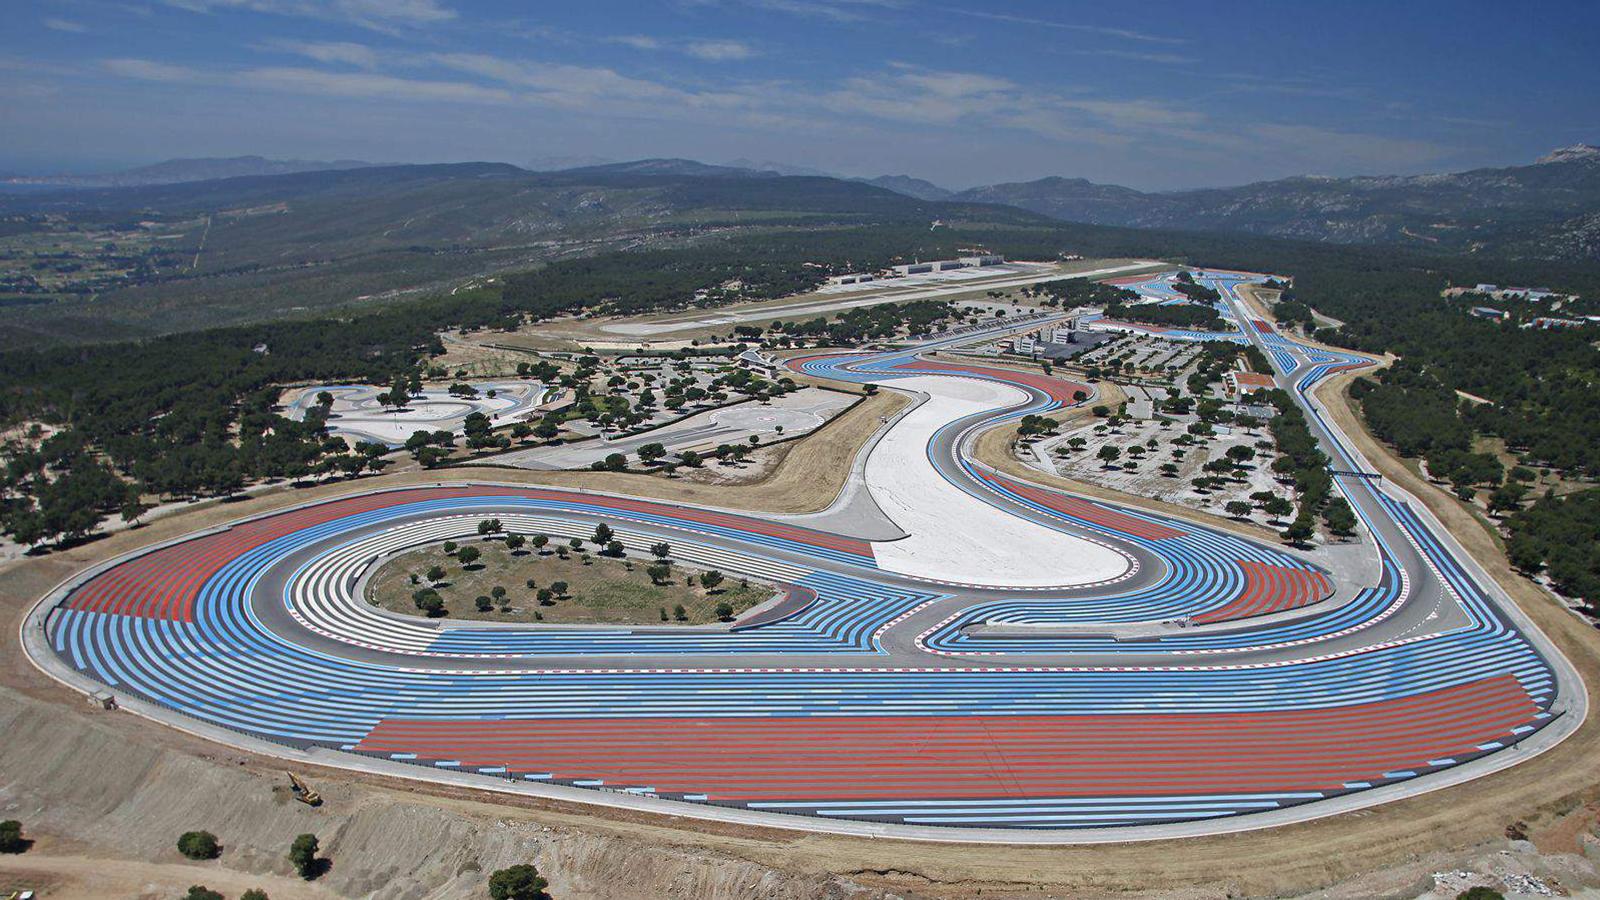 Paul Ricard, France - Round Four, 27 - 29 July 2018, Paul Ricard,France Pure McLaren GT Series> Read Race Report